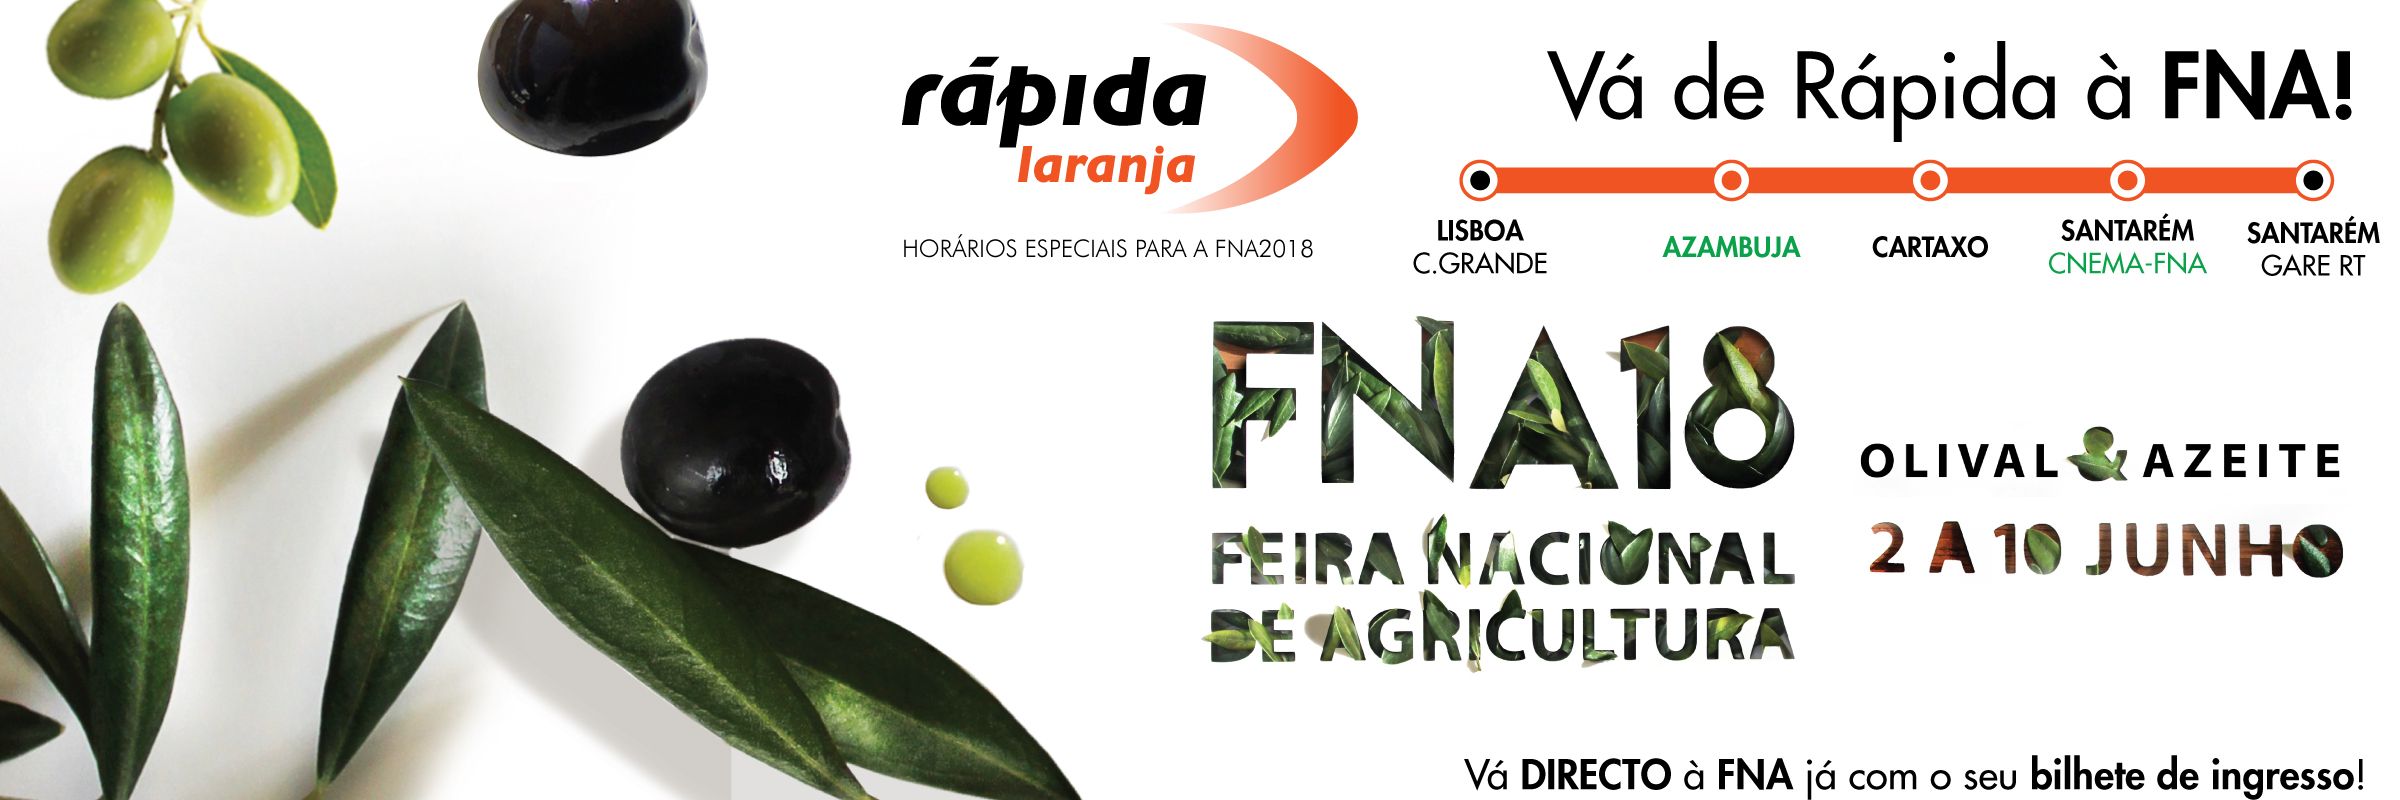 BANNER-RAPIDA-LARANJA-FNA2018